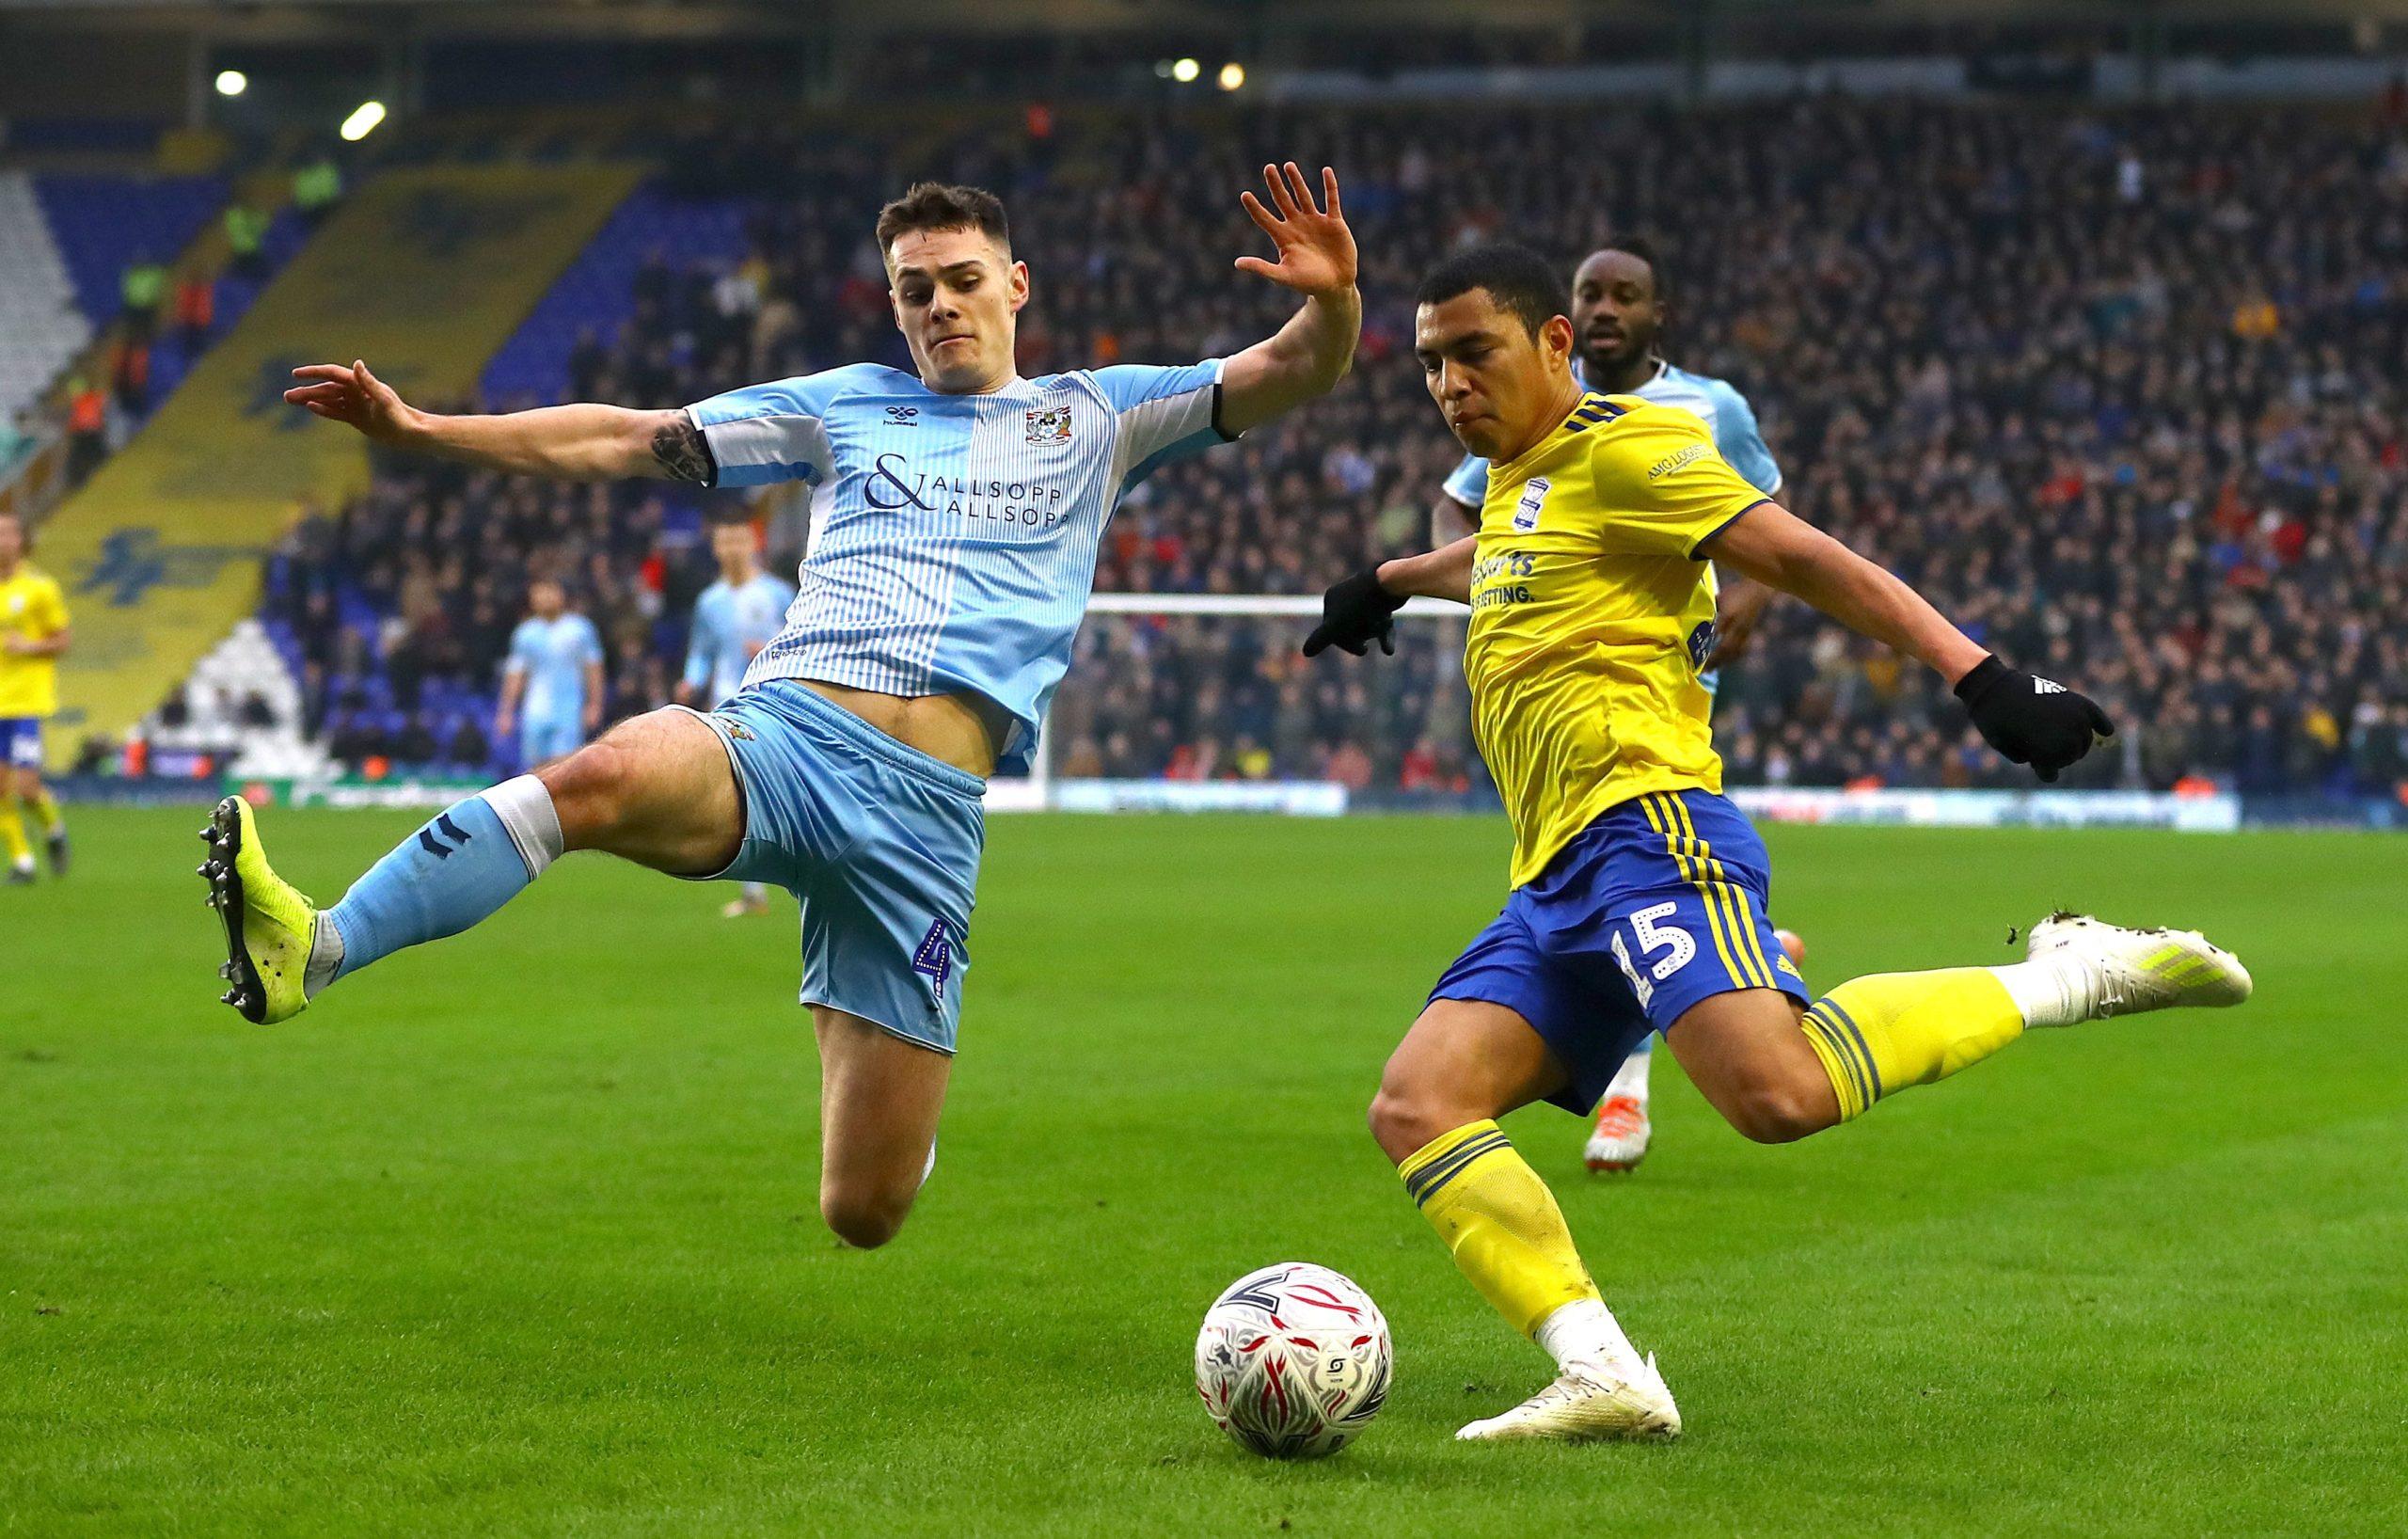 Michael Rose of Coventry City challenges Jefferson Montero of Birmingham City.